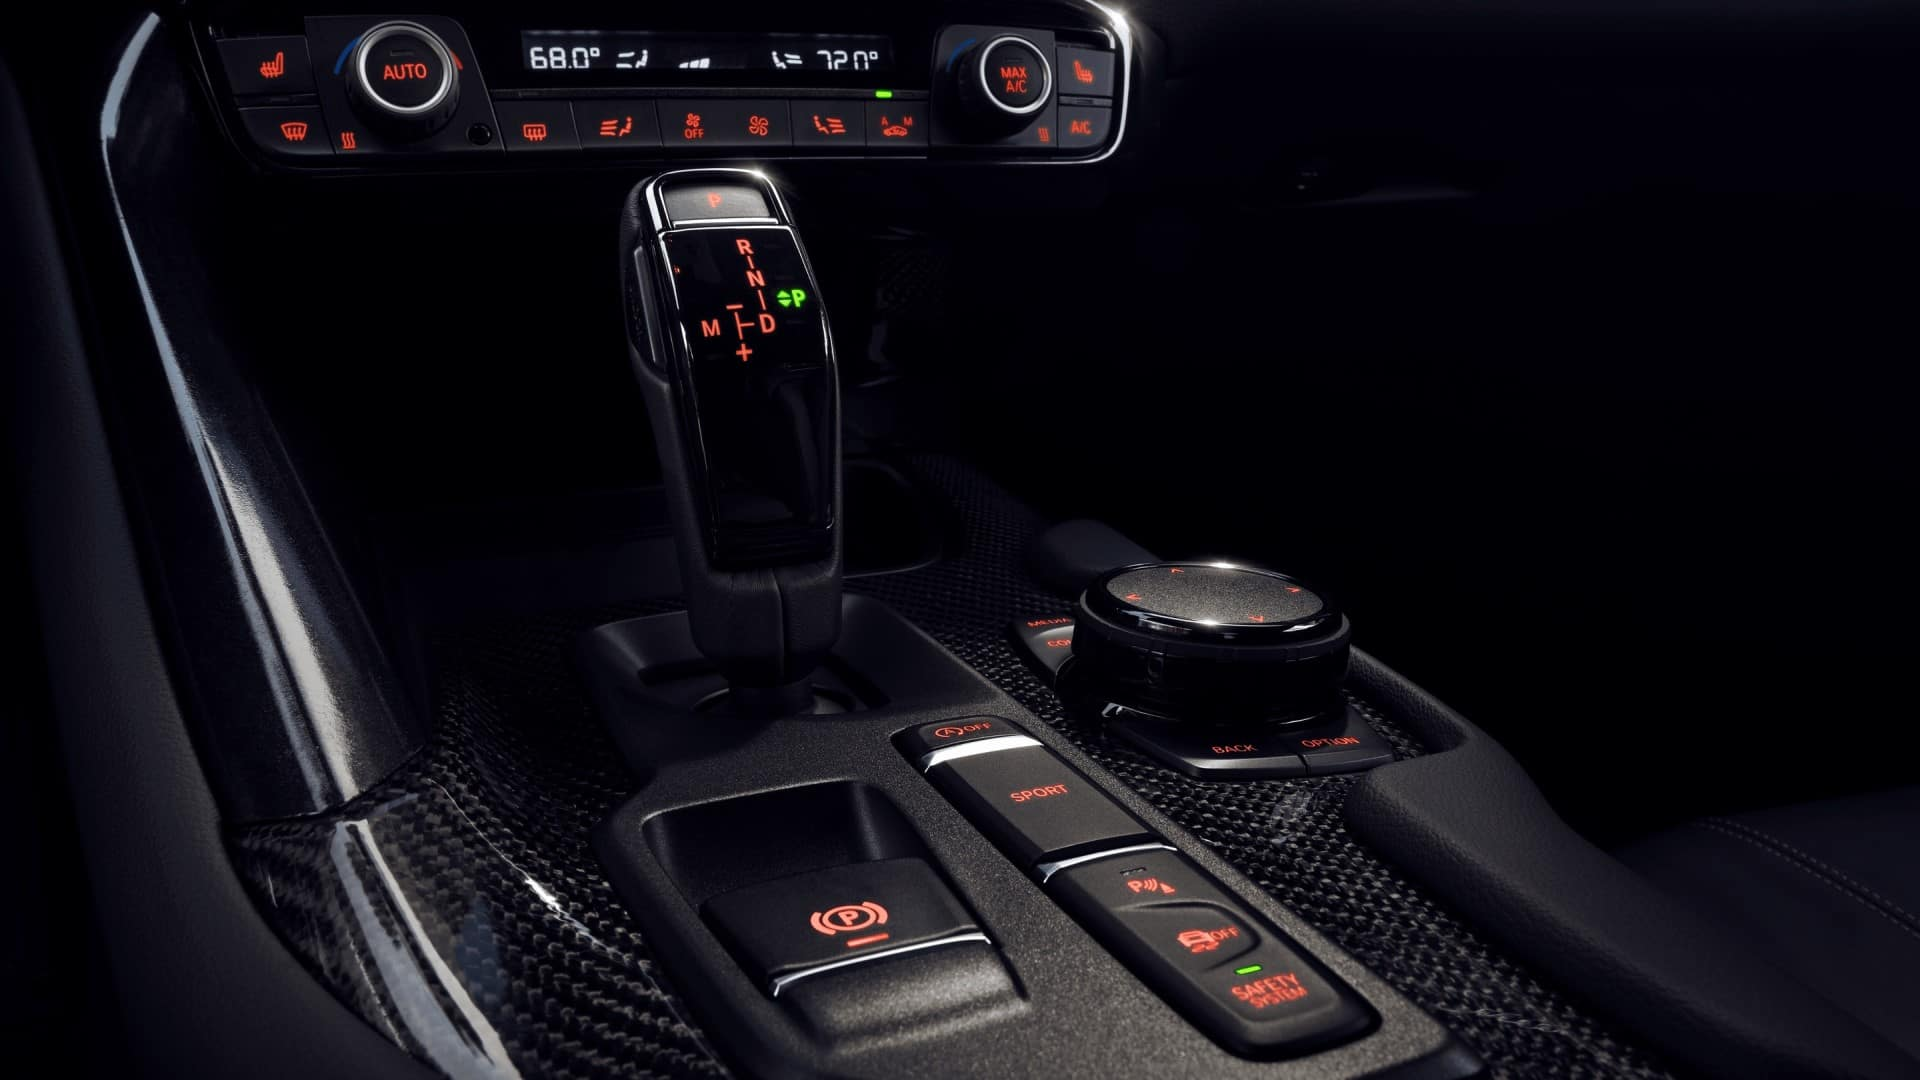 Toyota_Supra_Interior_Gear_Shifter